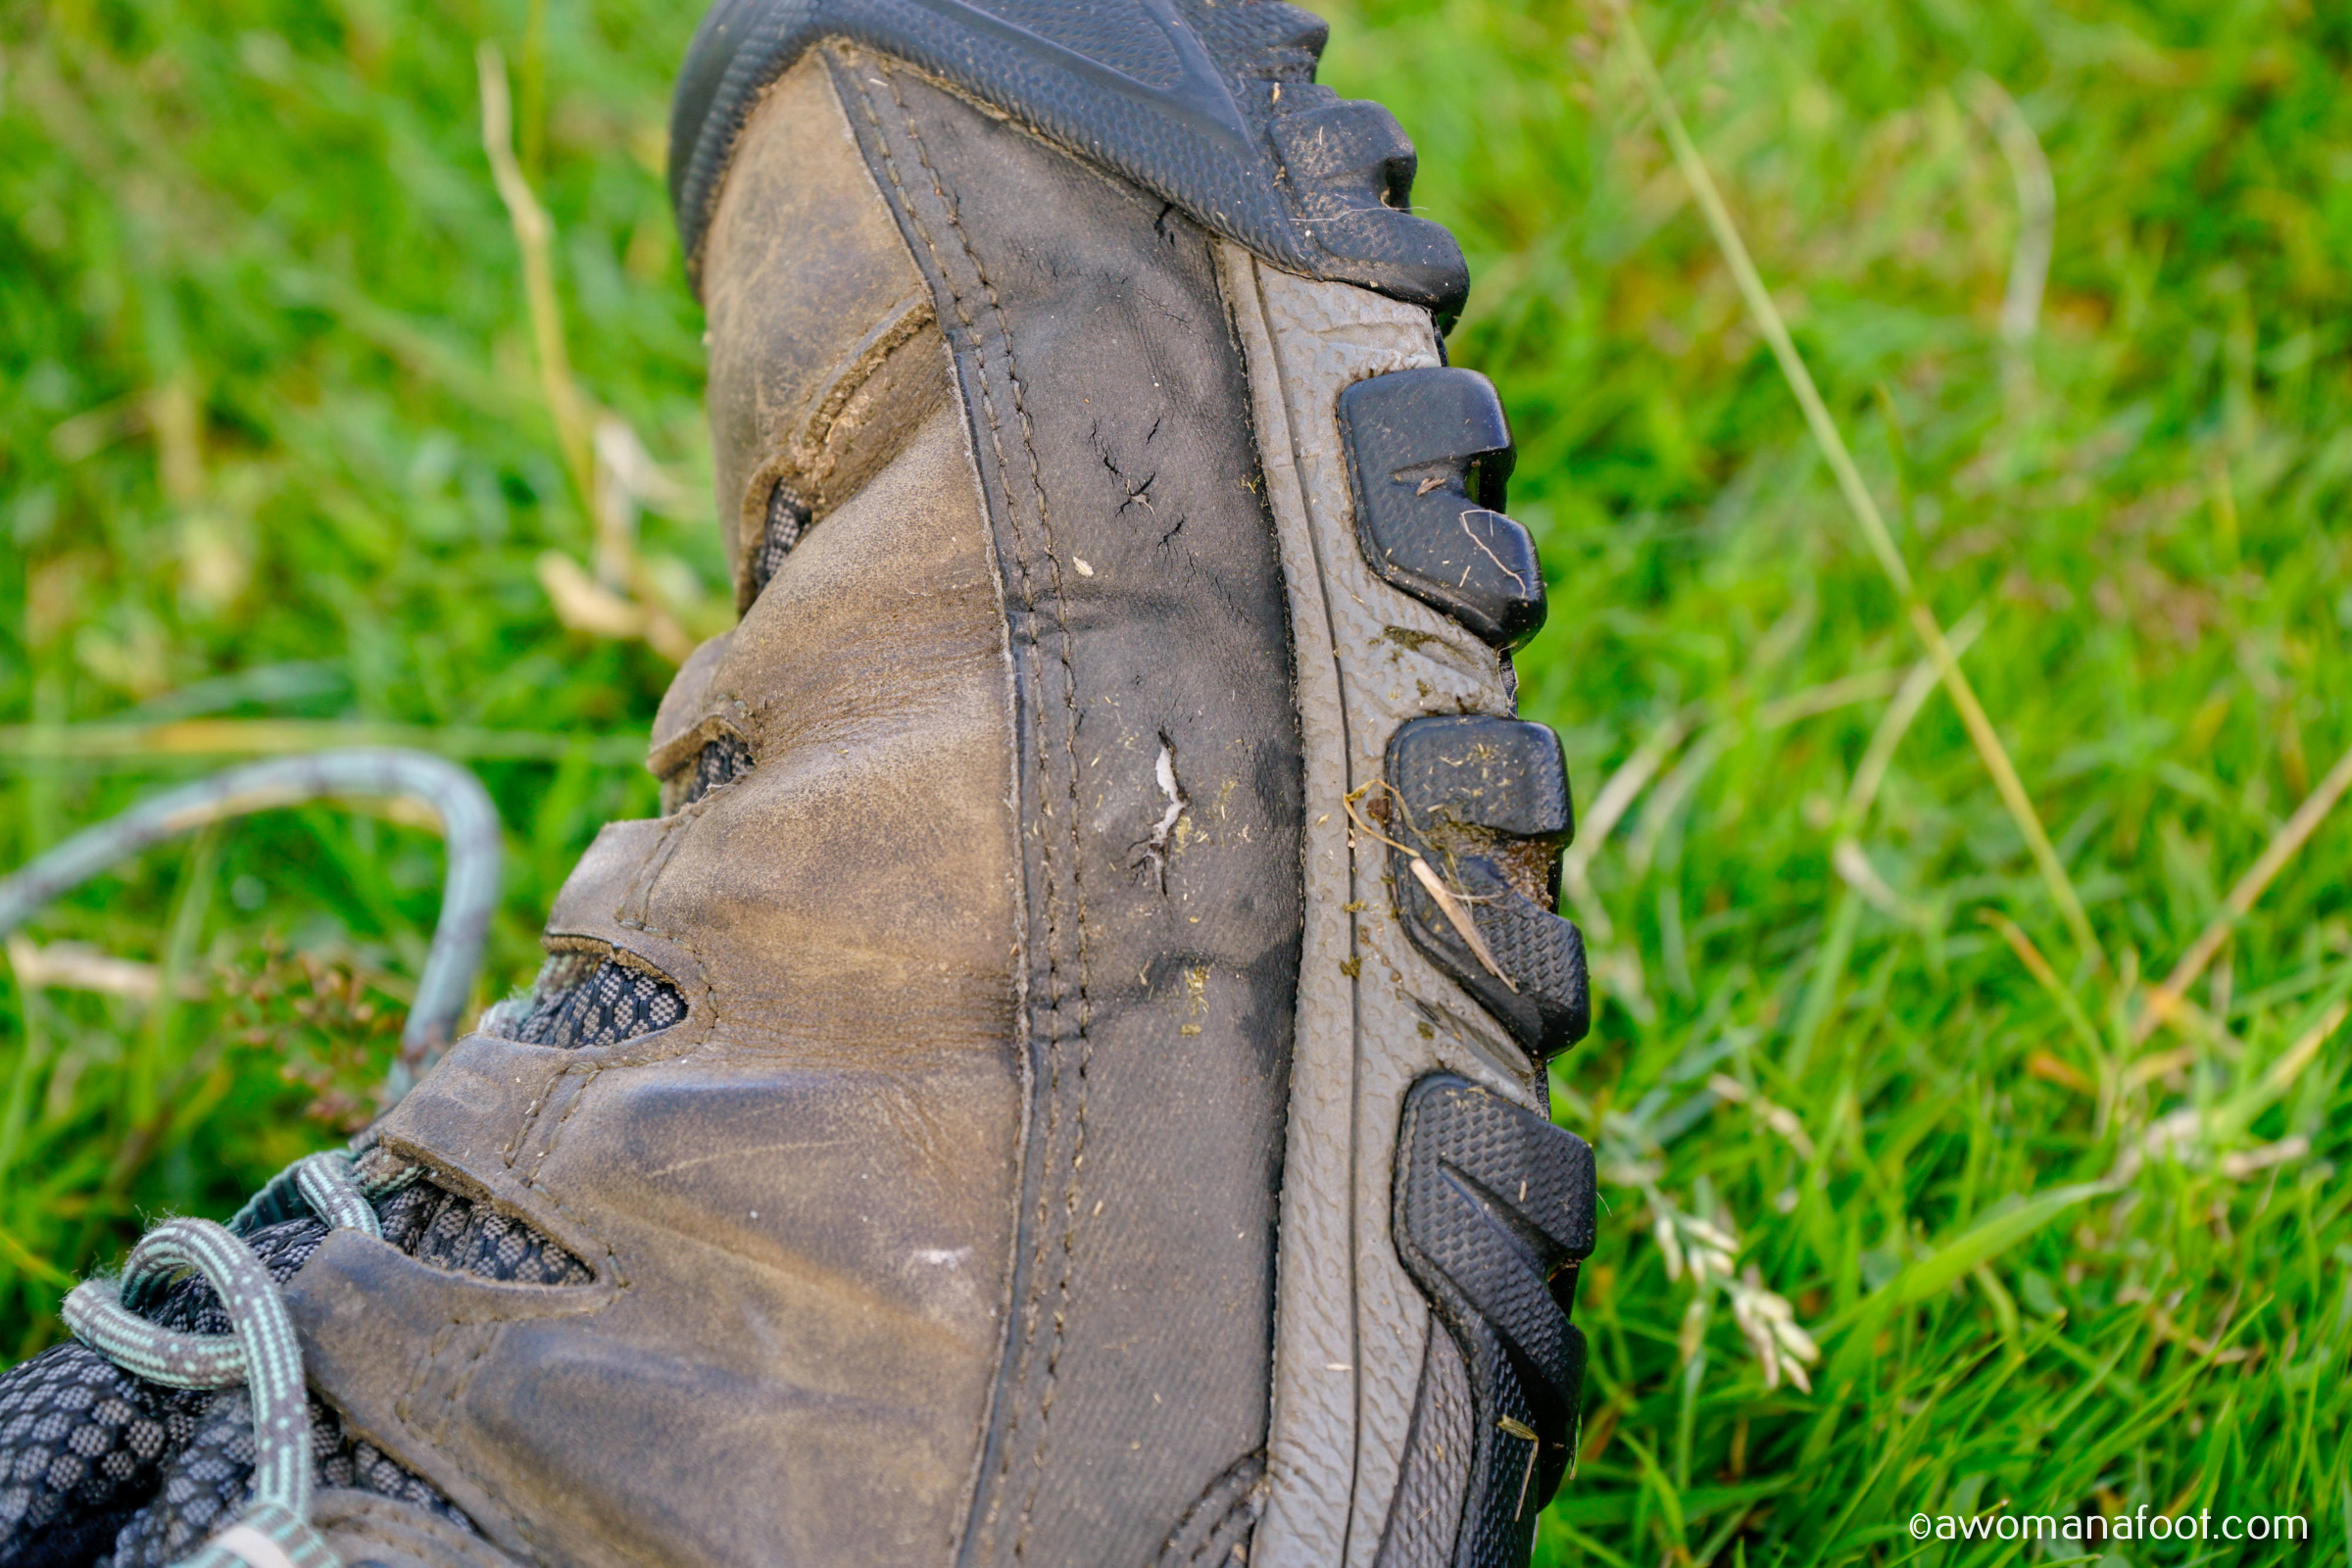 Keen Targhee III hiking boots women review9.jpg